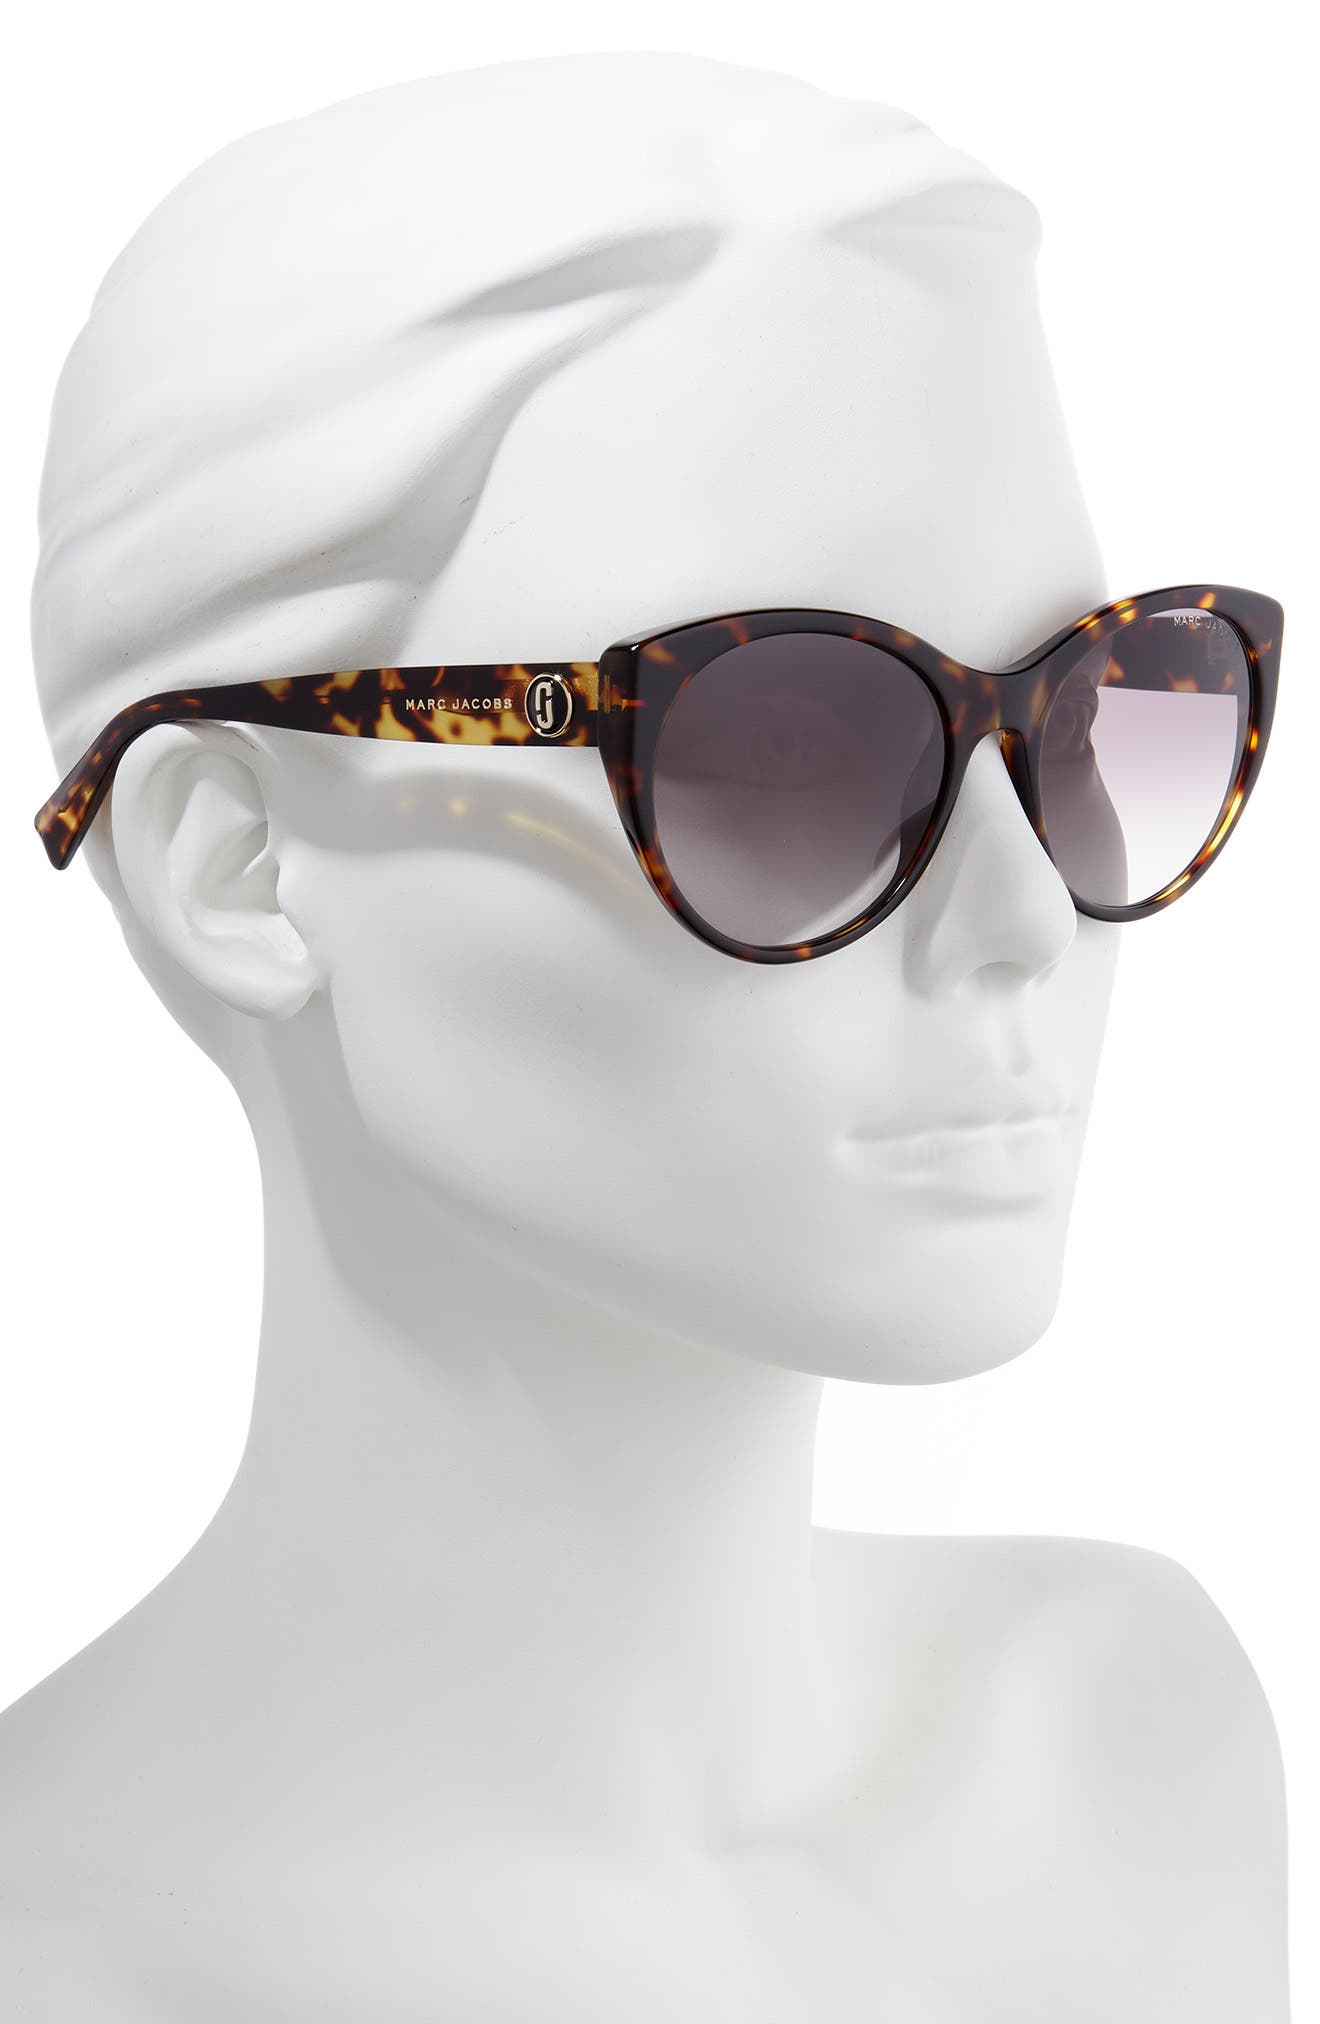 MARC JACOBS,                             57mm Round Sunglasses,                             Alternate thumbnail 2, color,                             BLACK DARK HAVANA